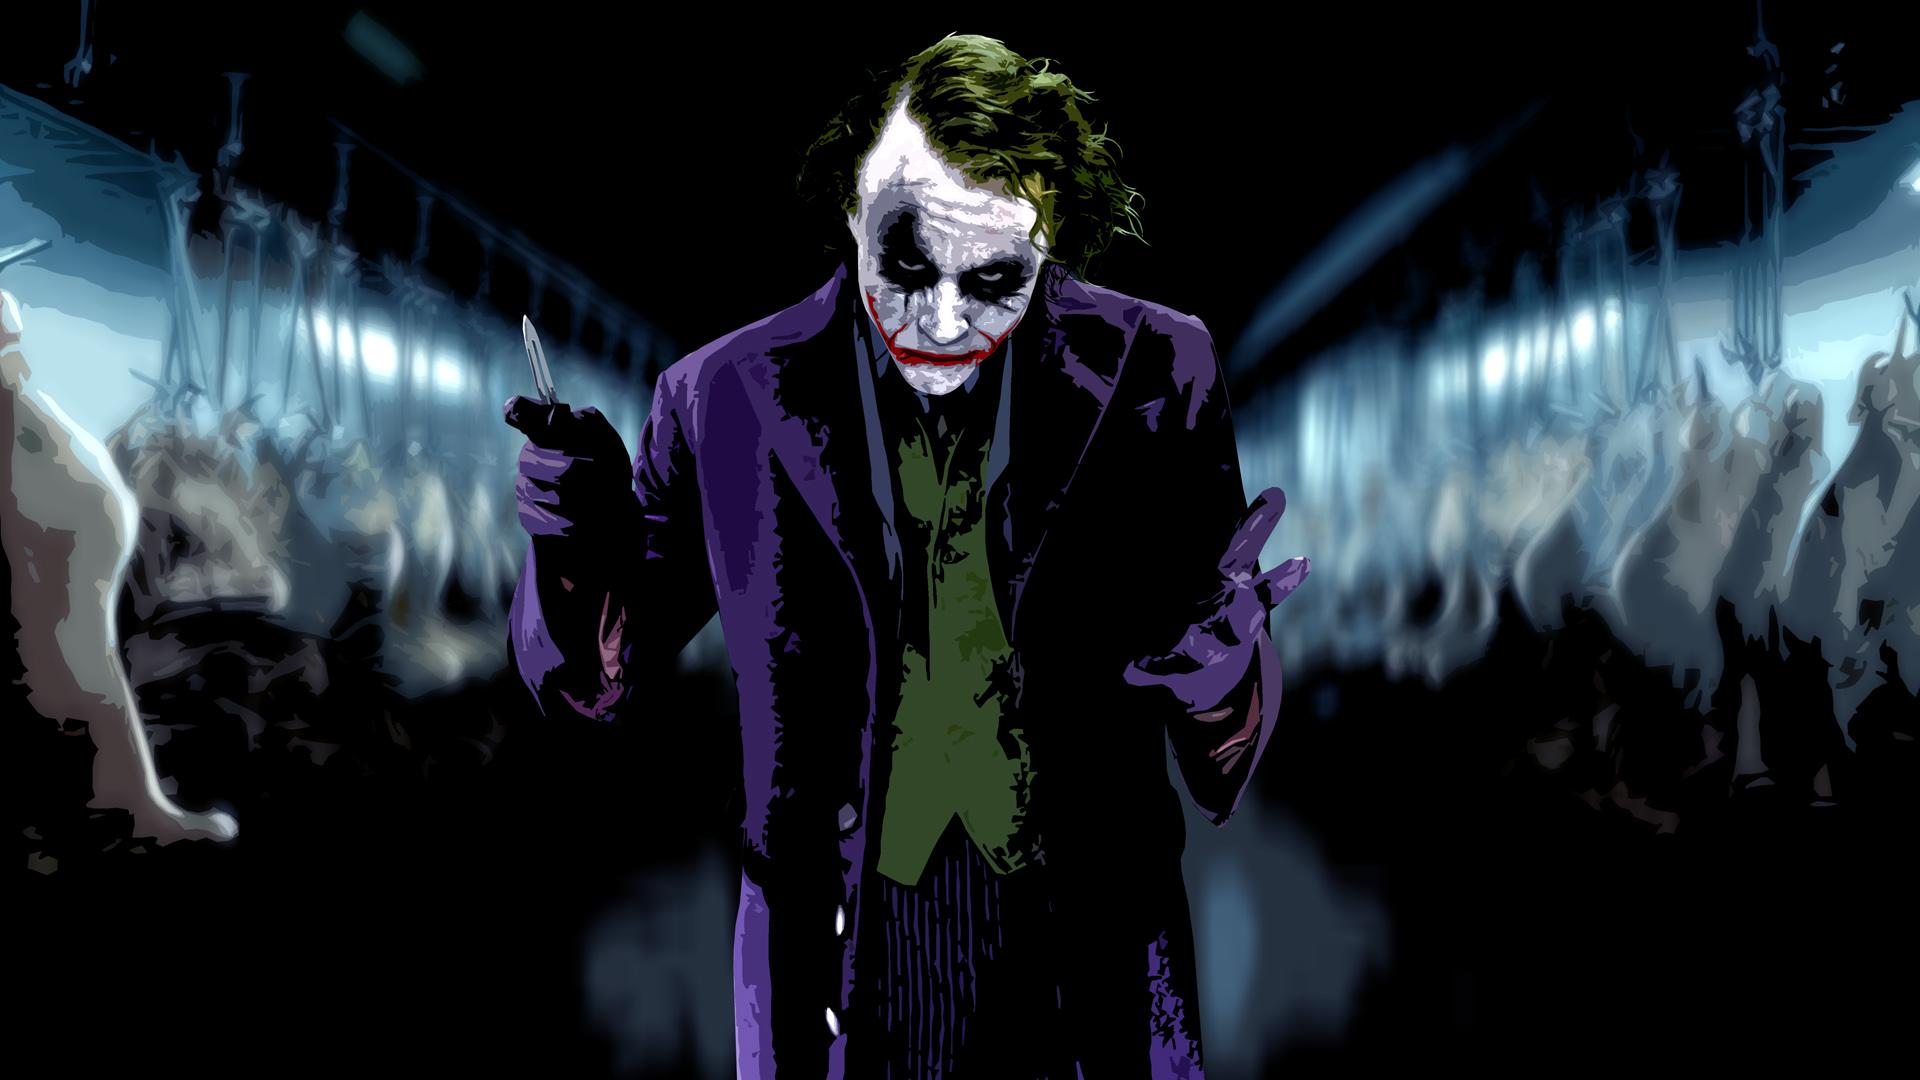 47+ The Joker Heath Ledger Wallpaper on WallpaperSafari